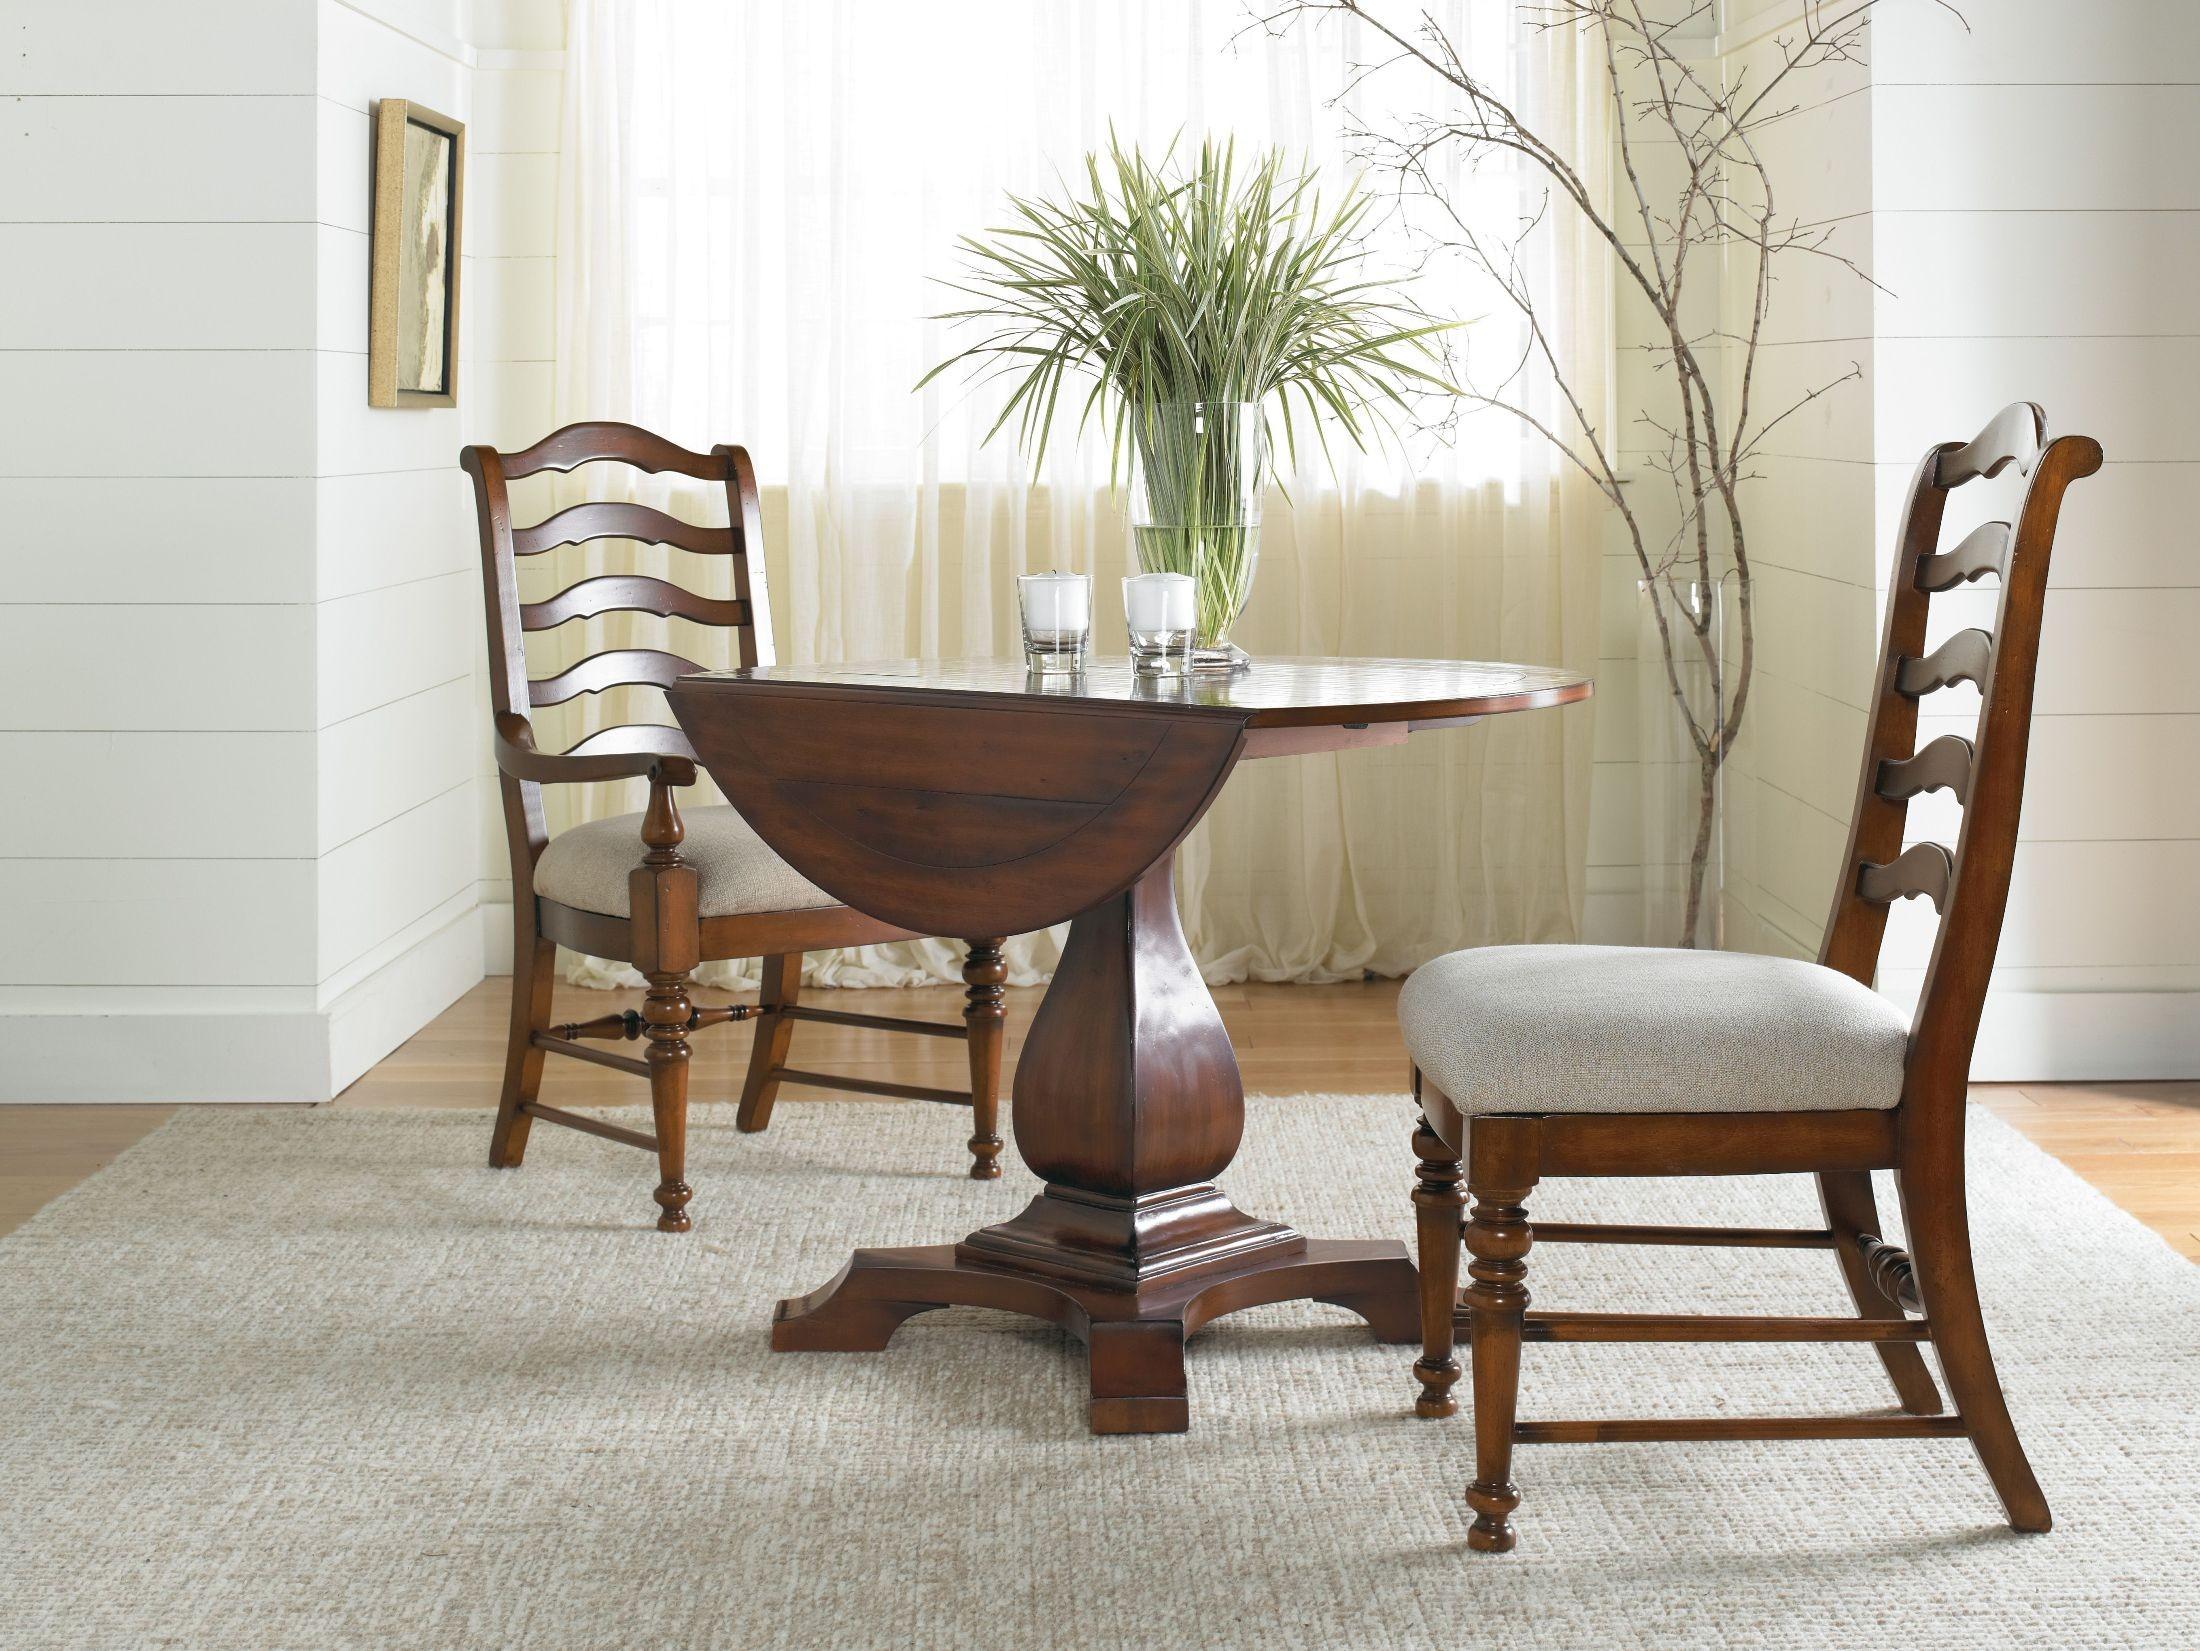 Waverly place cherry round pedestal dining room set from for Round pedestal dining table set with leaf